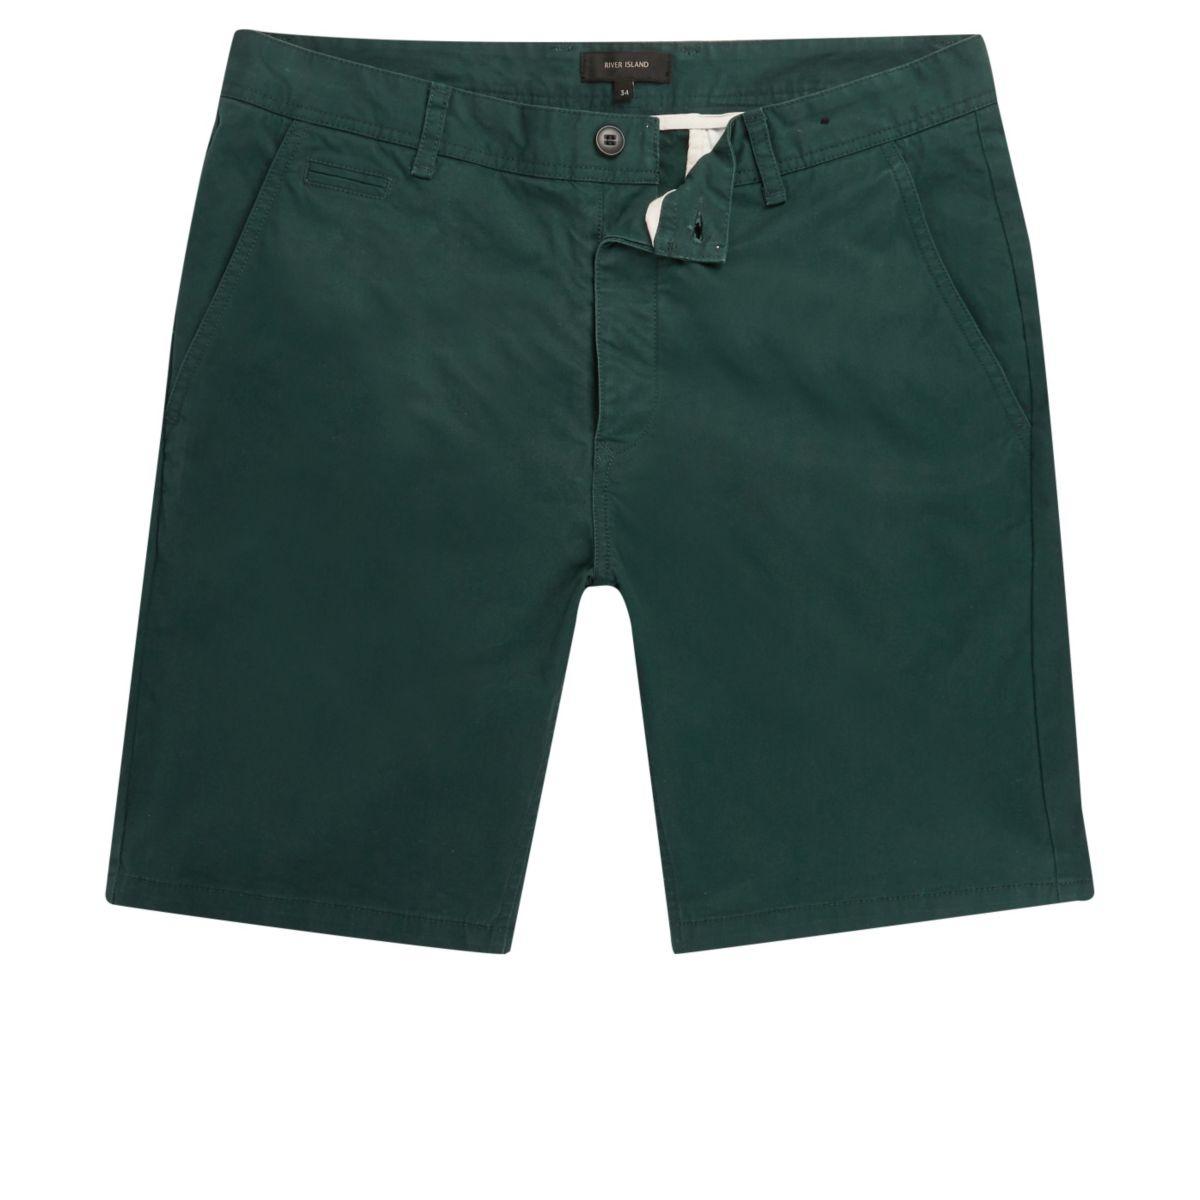 Green slim fit shorts